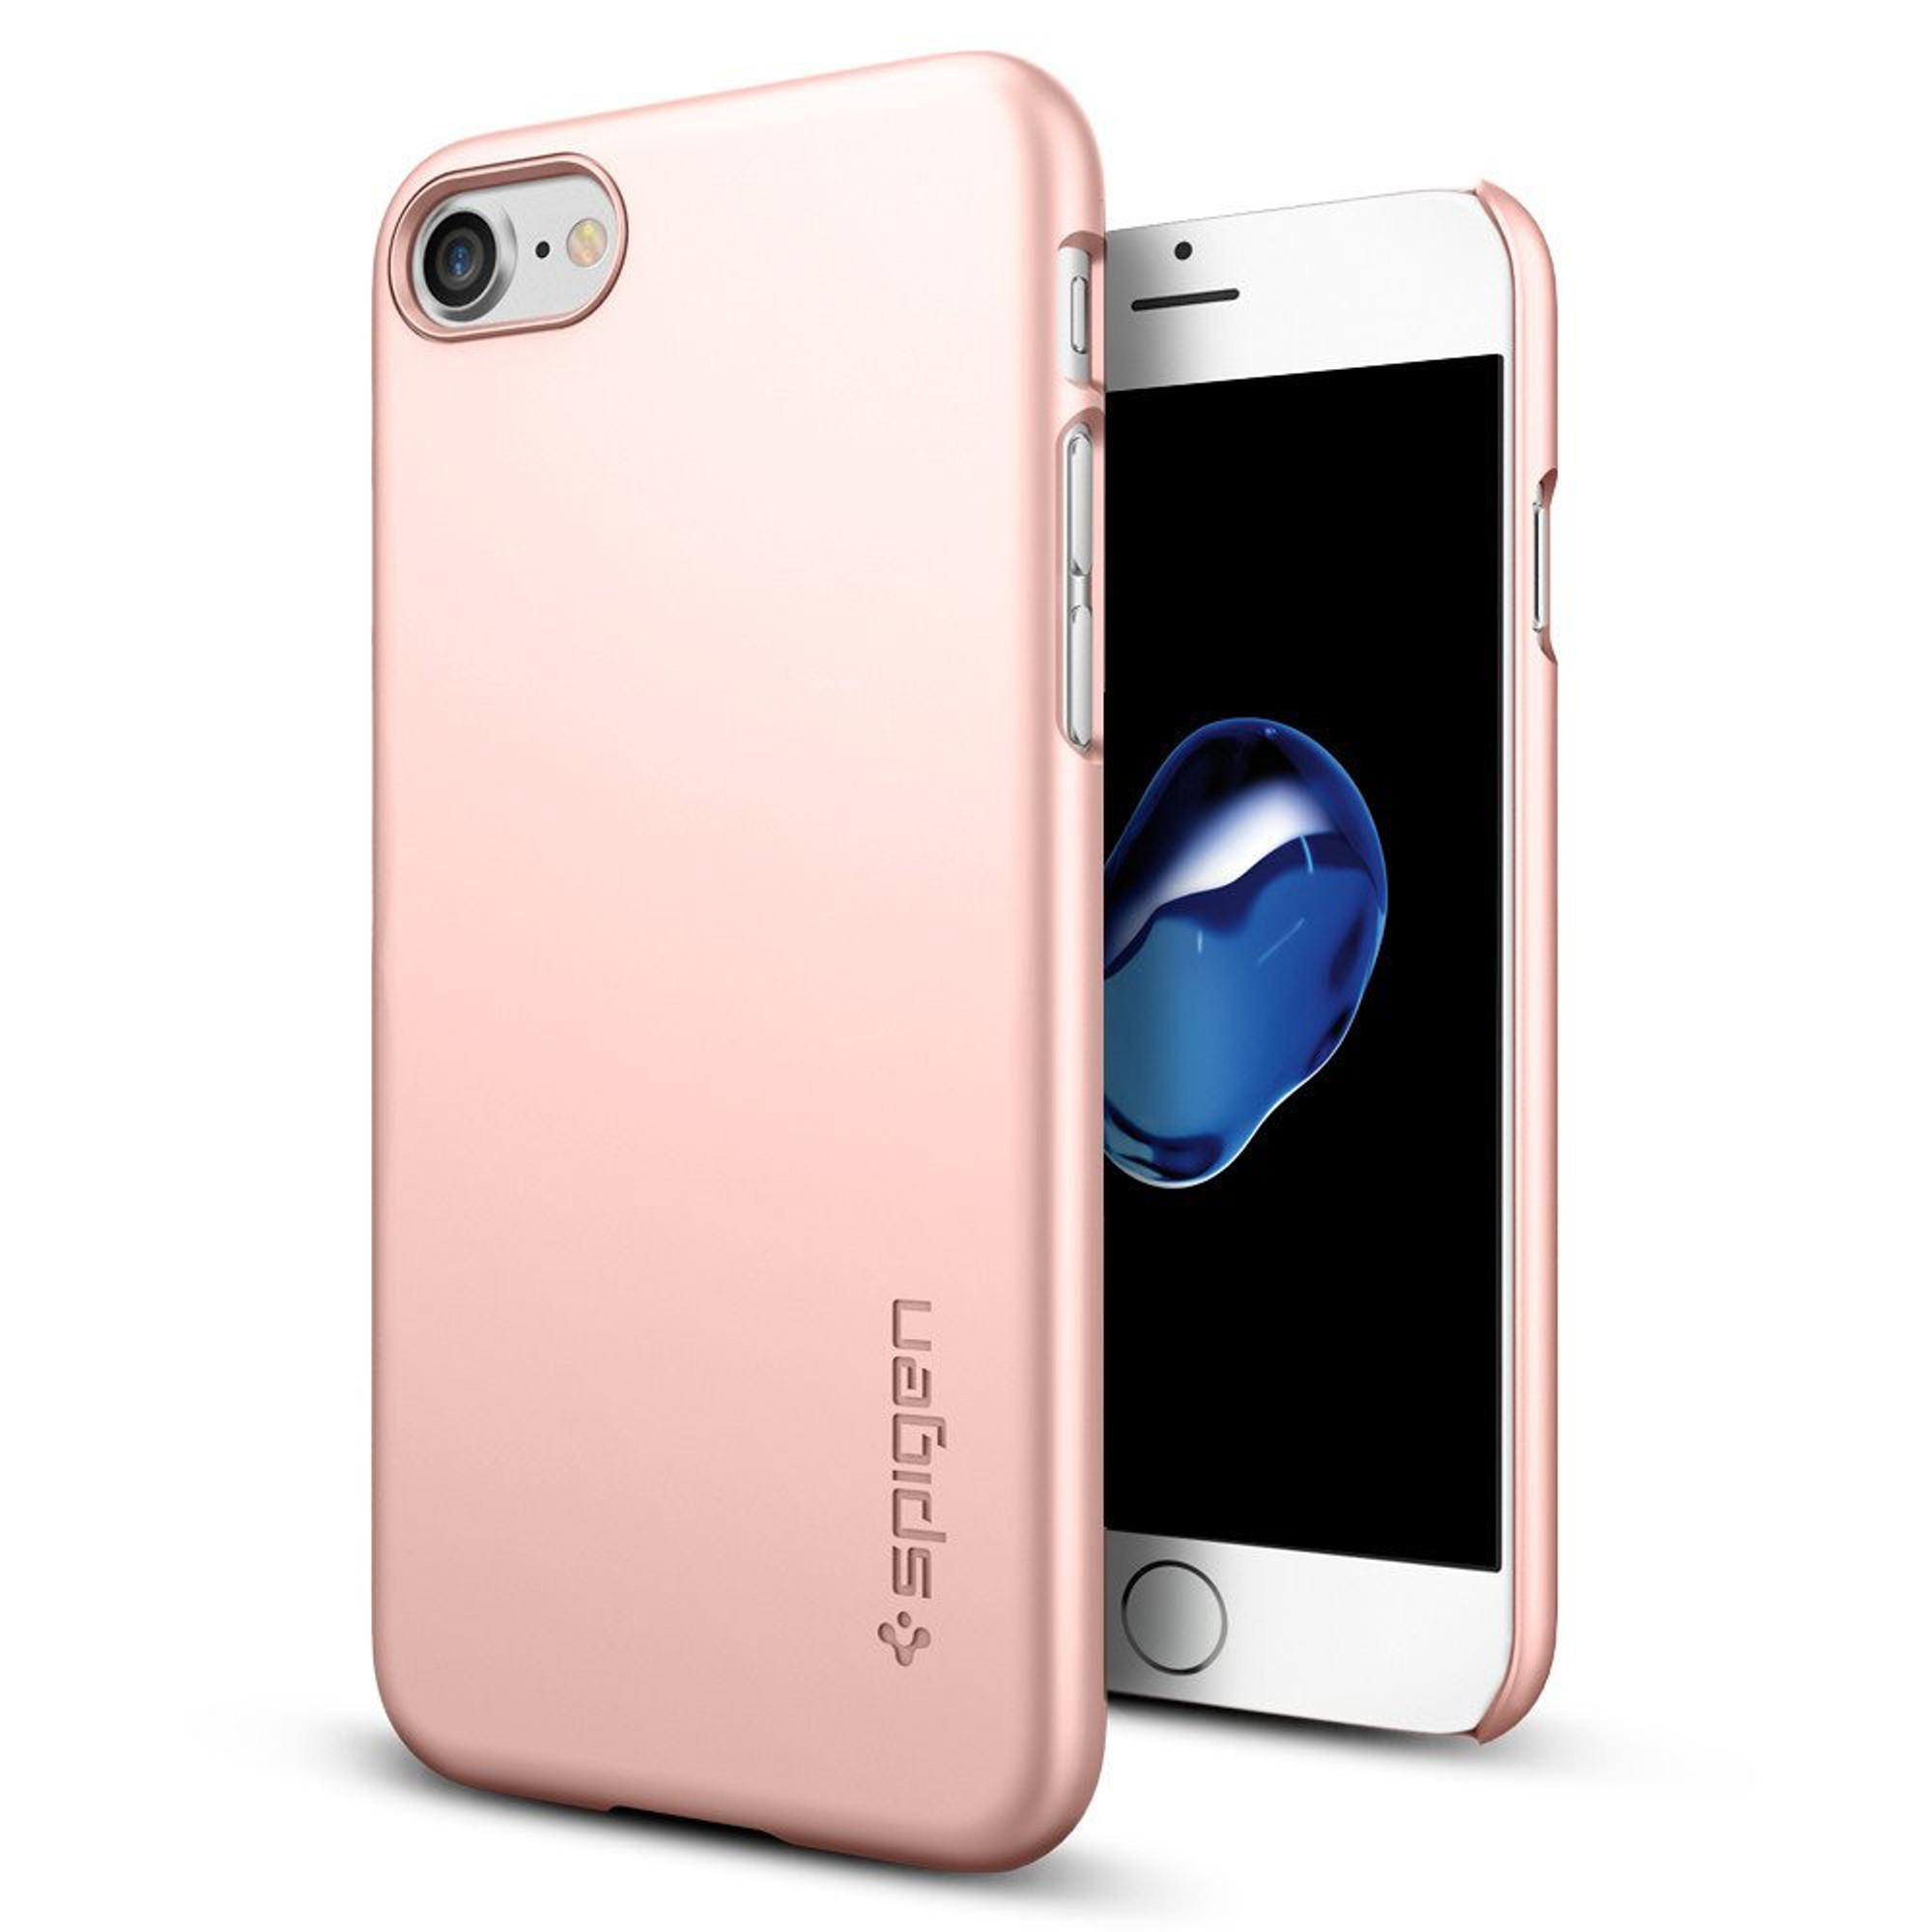 Spigen Thin Fit Case for iPhone 7 - Rose Gold